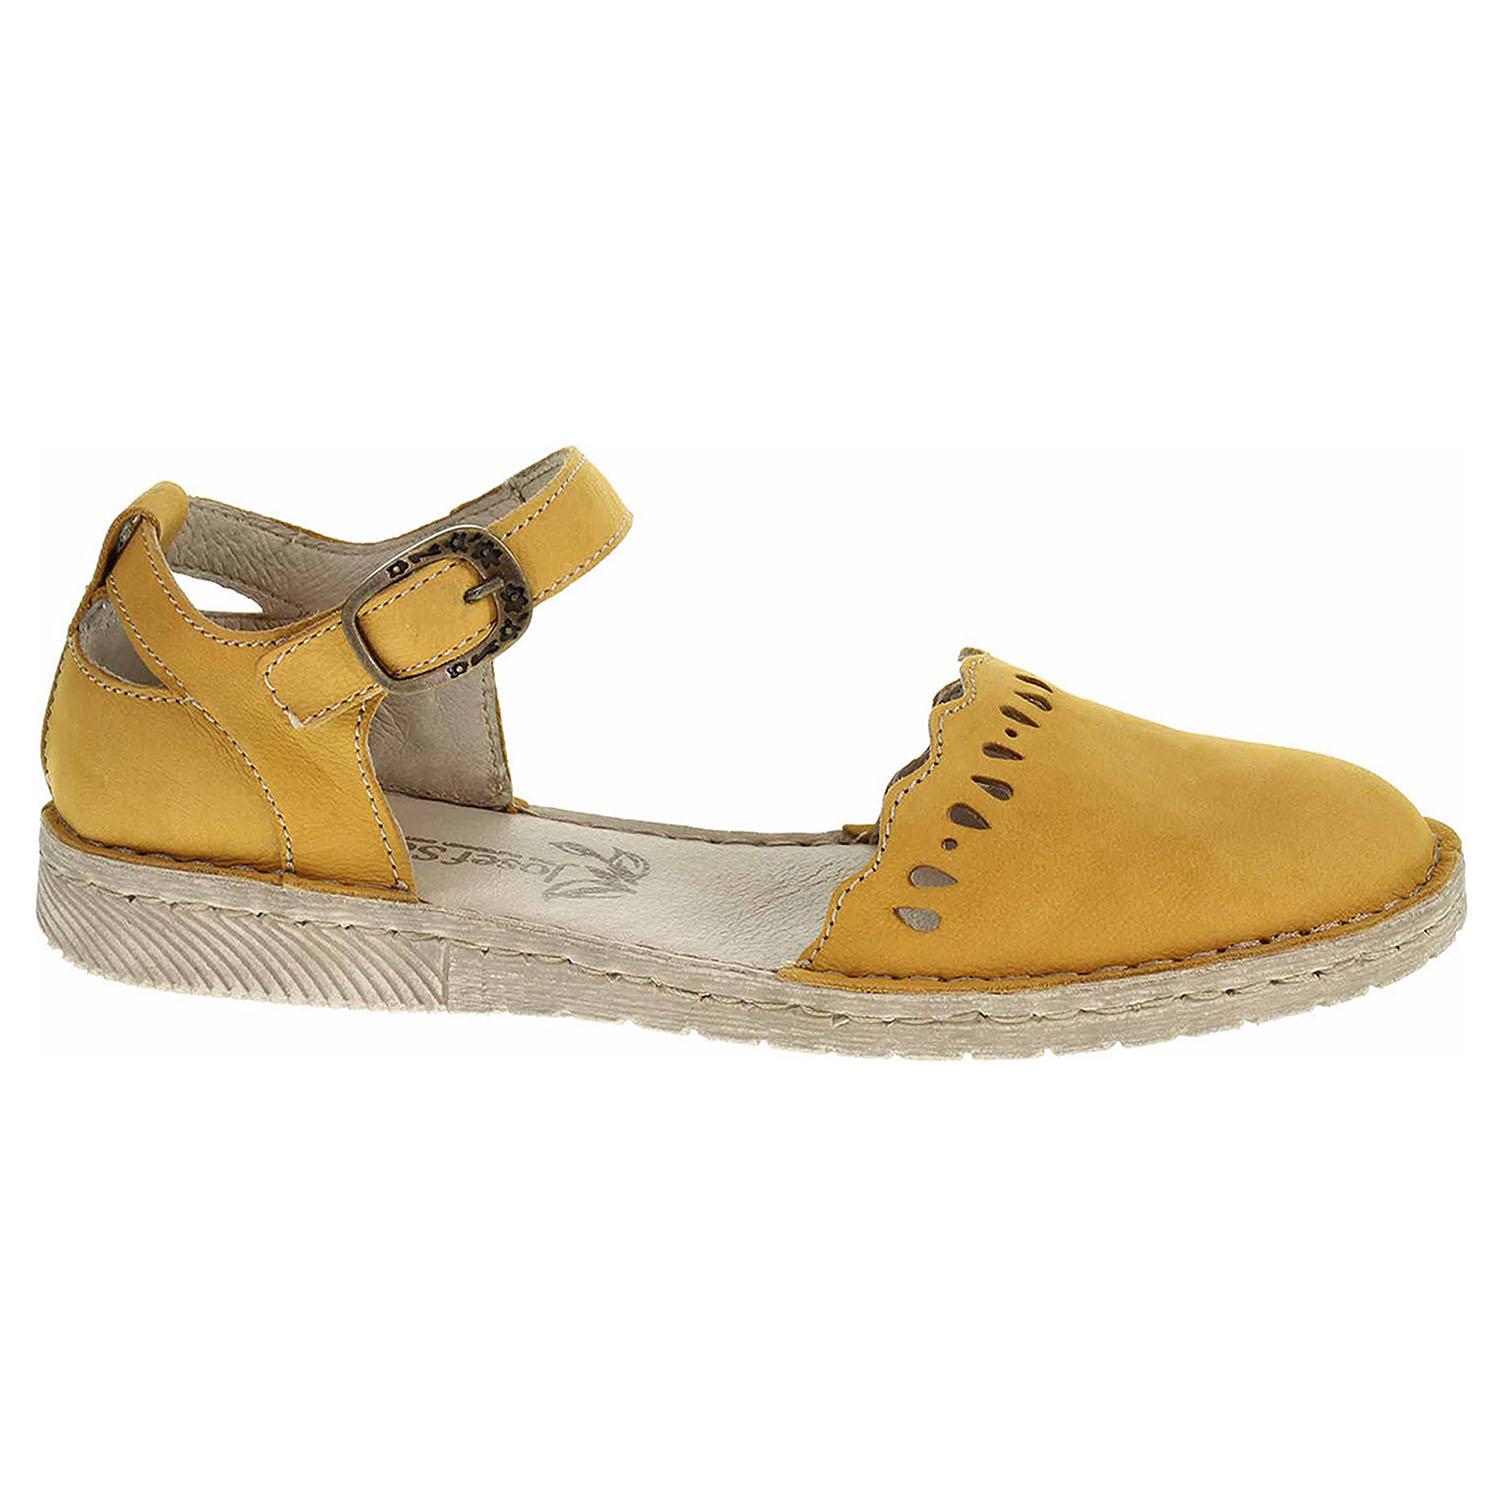 Dámská obuv Josef Seibel 71836 904800 gelb 71836 904 800 43